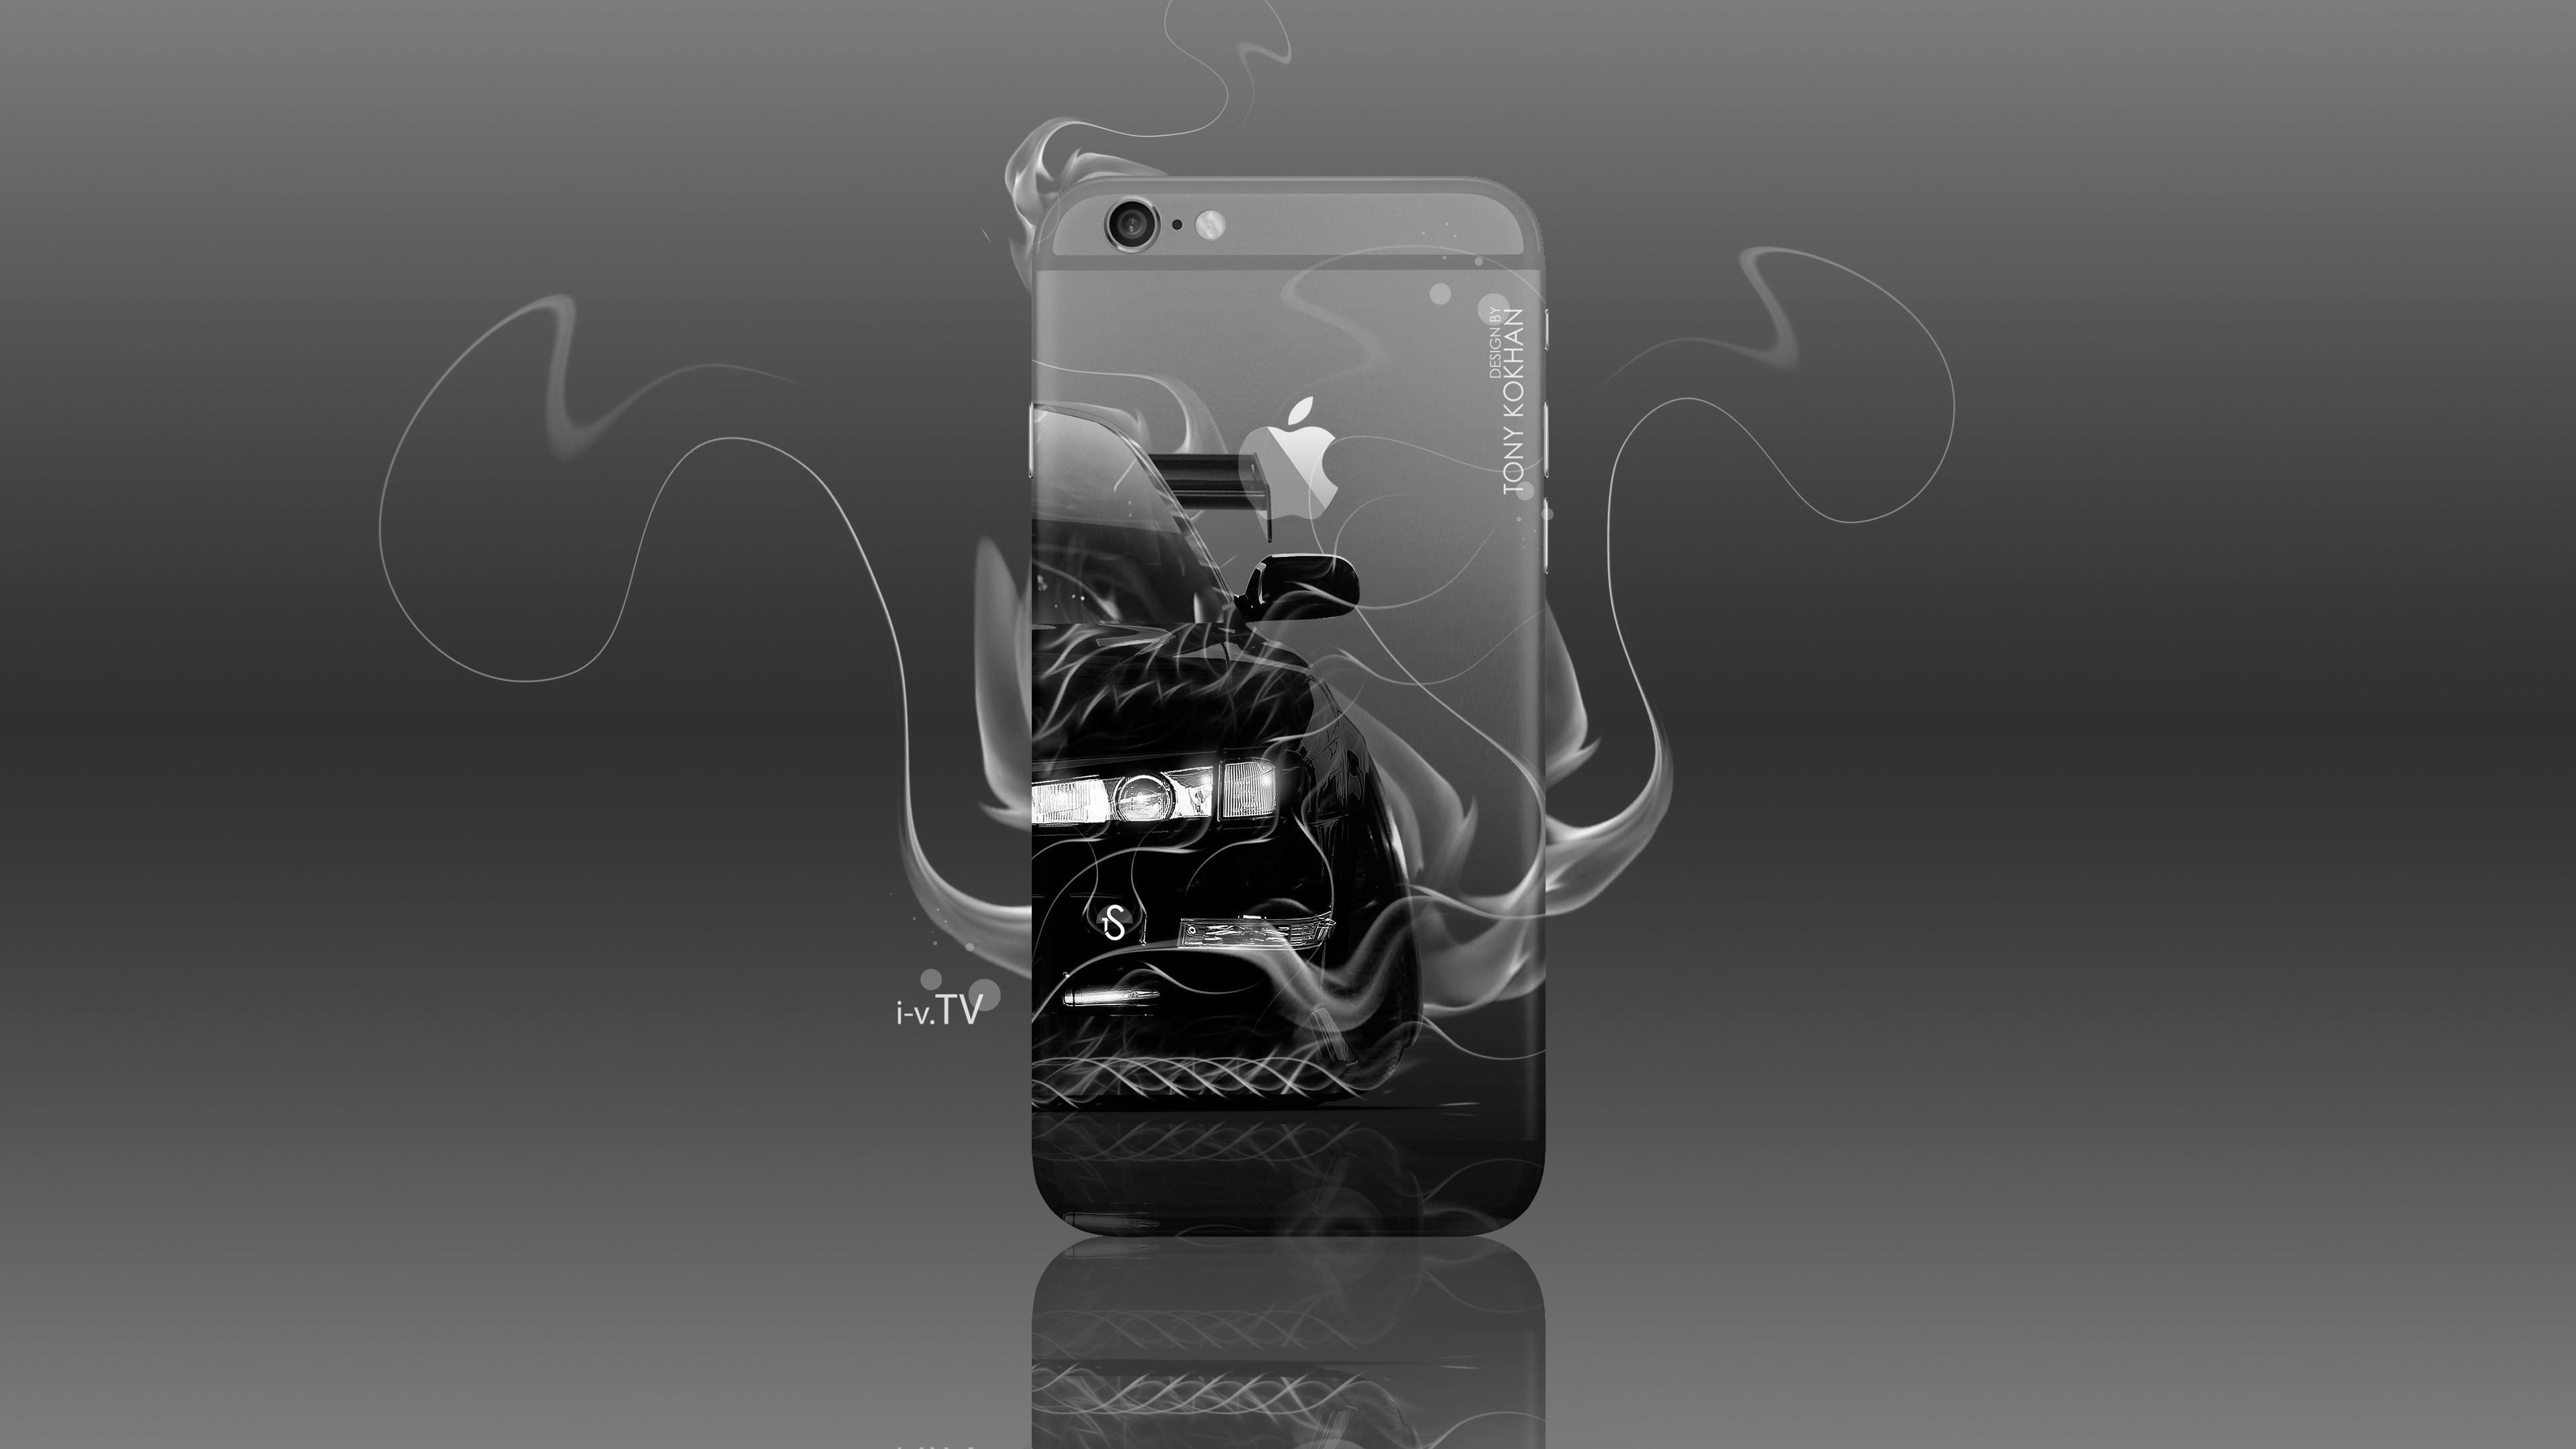 … Apple-iPhone-6-Plus-Gadget-Back-Logo-View-